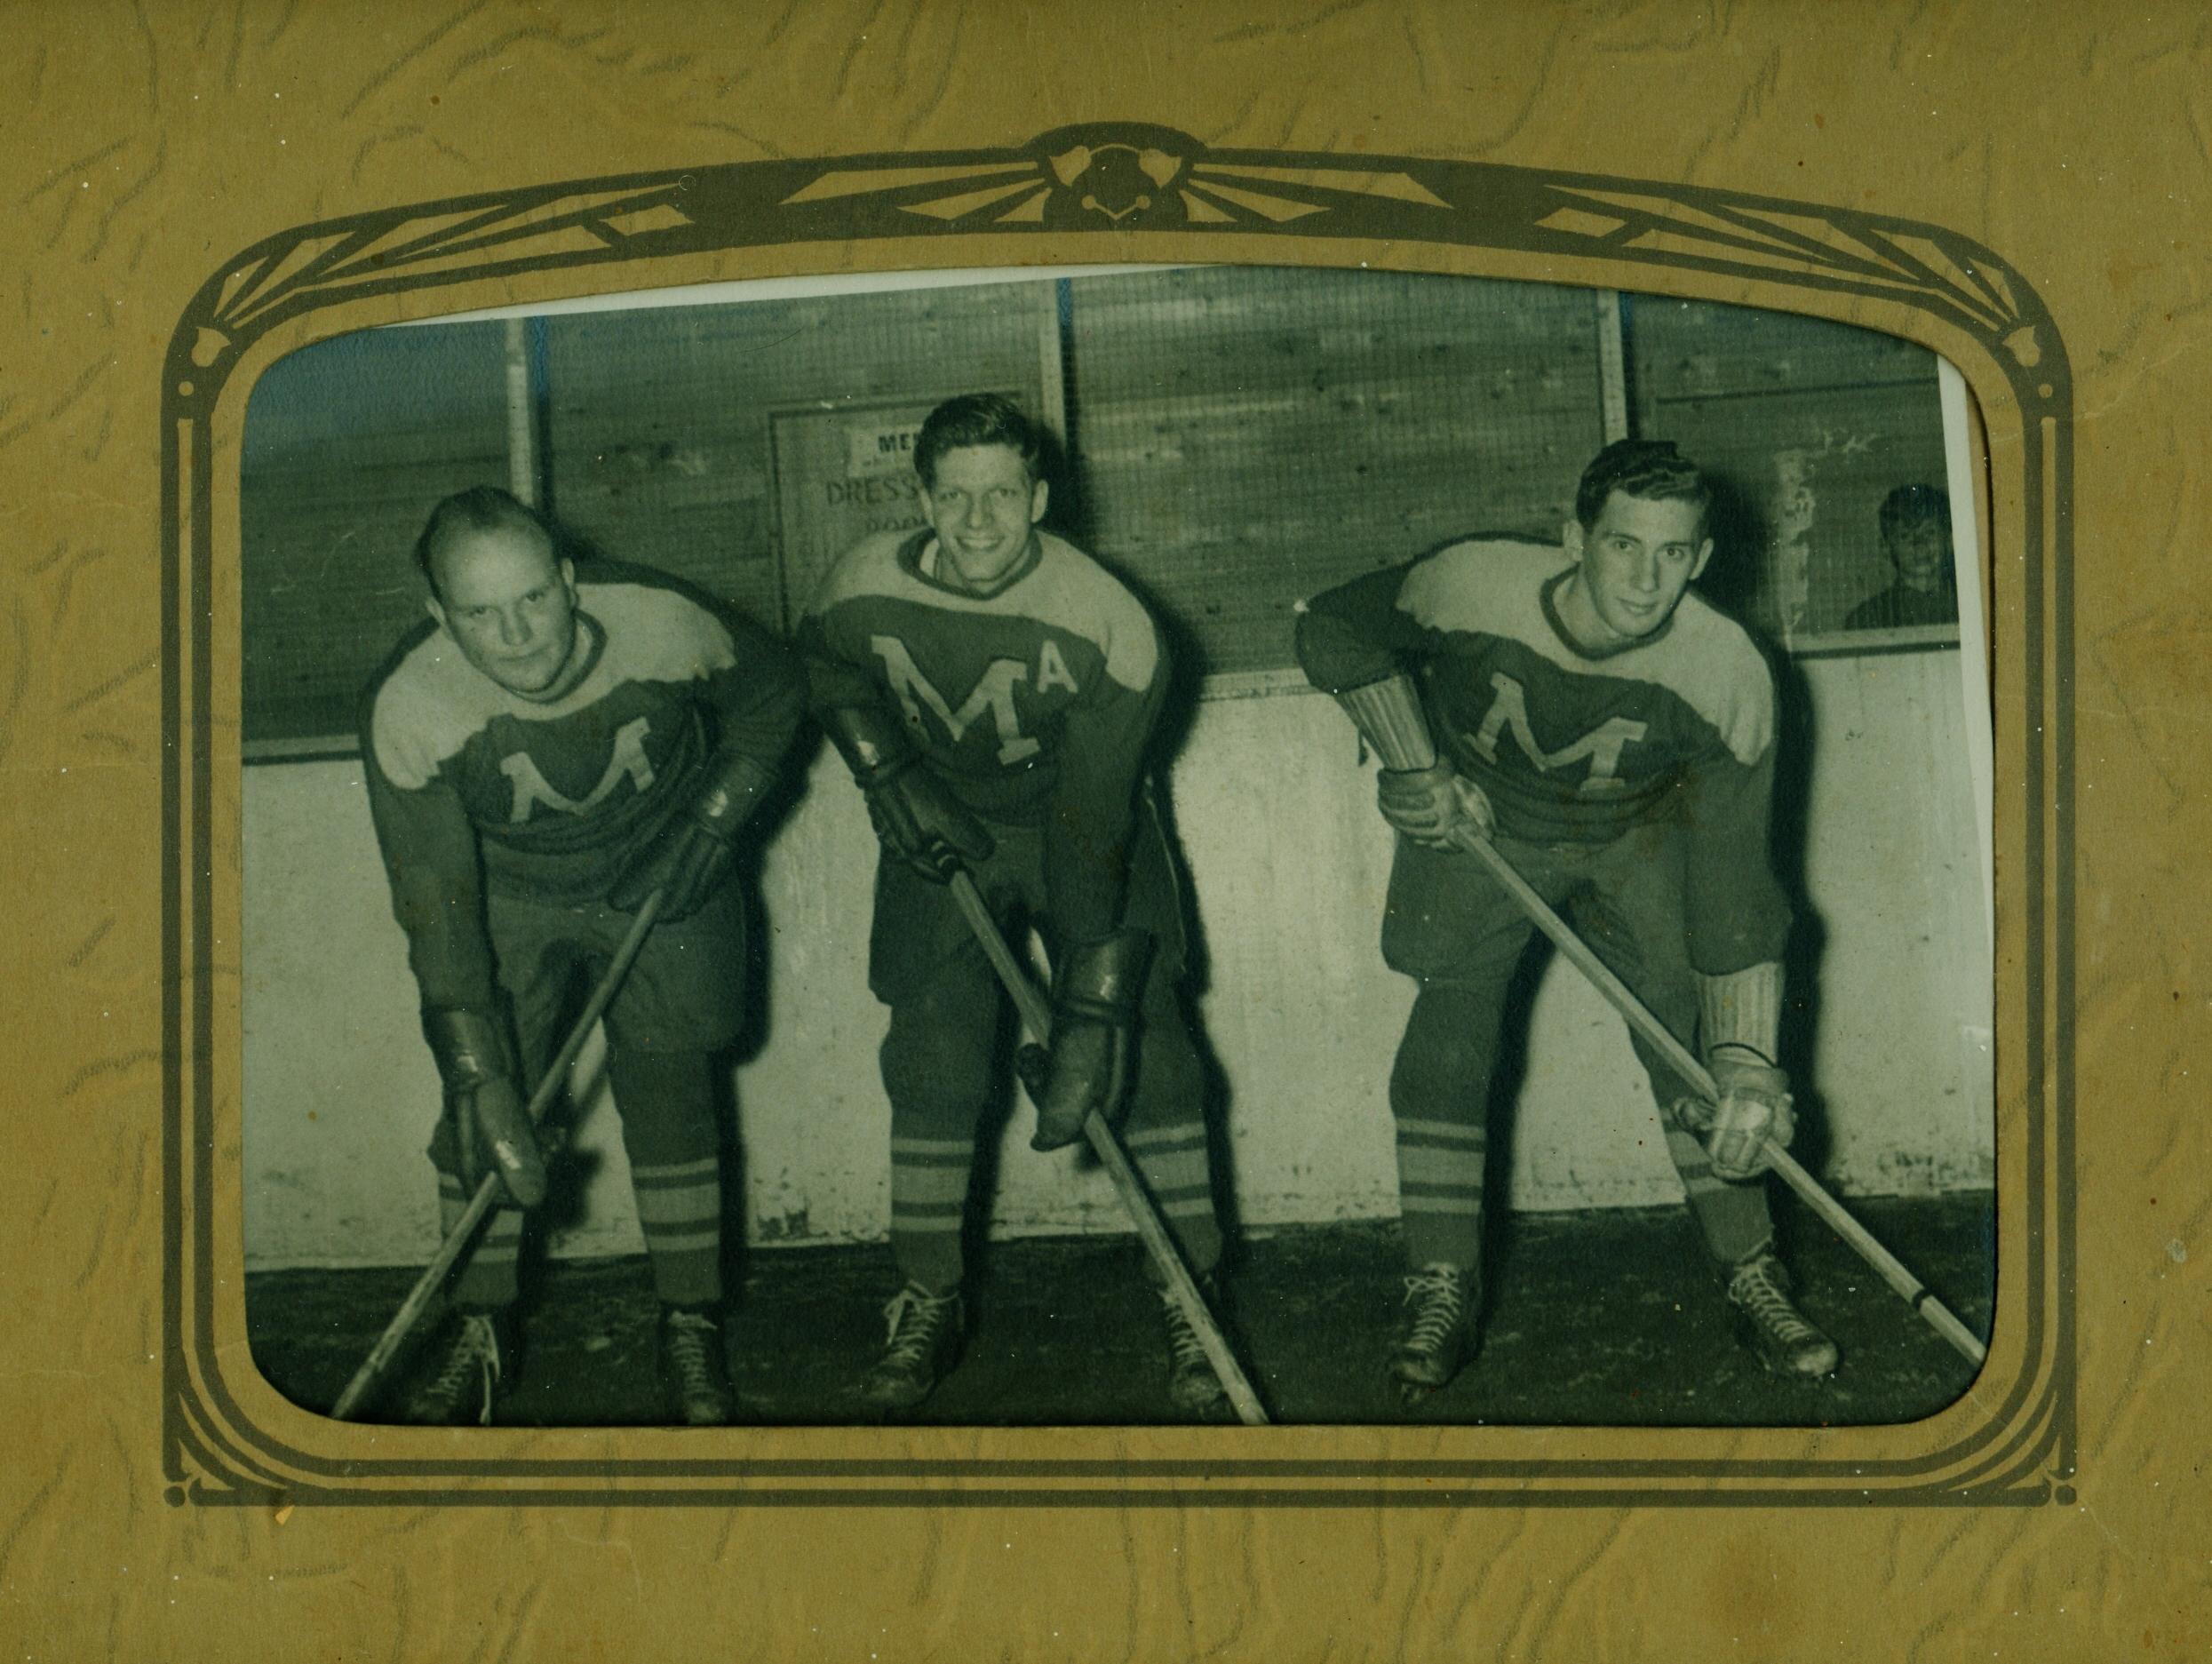 Men's Hockey, Dean Lavender, Tom Cousins, Stub (Ken) Trumble